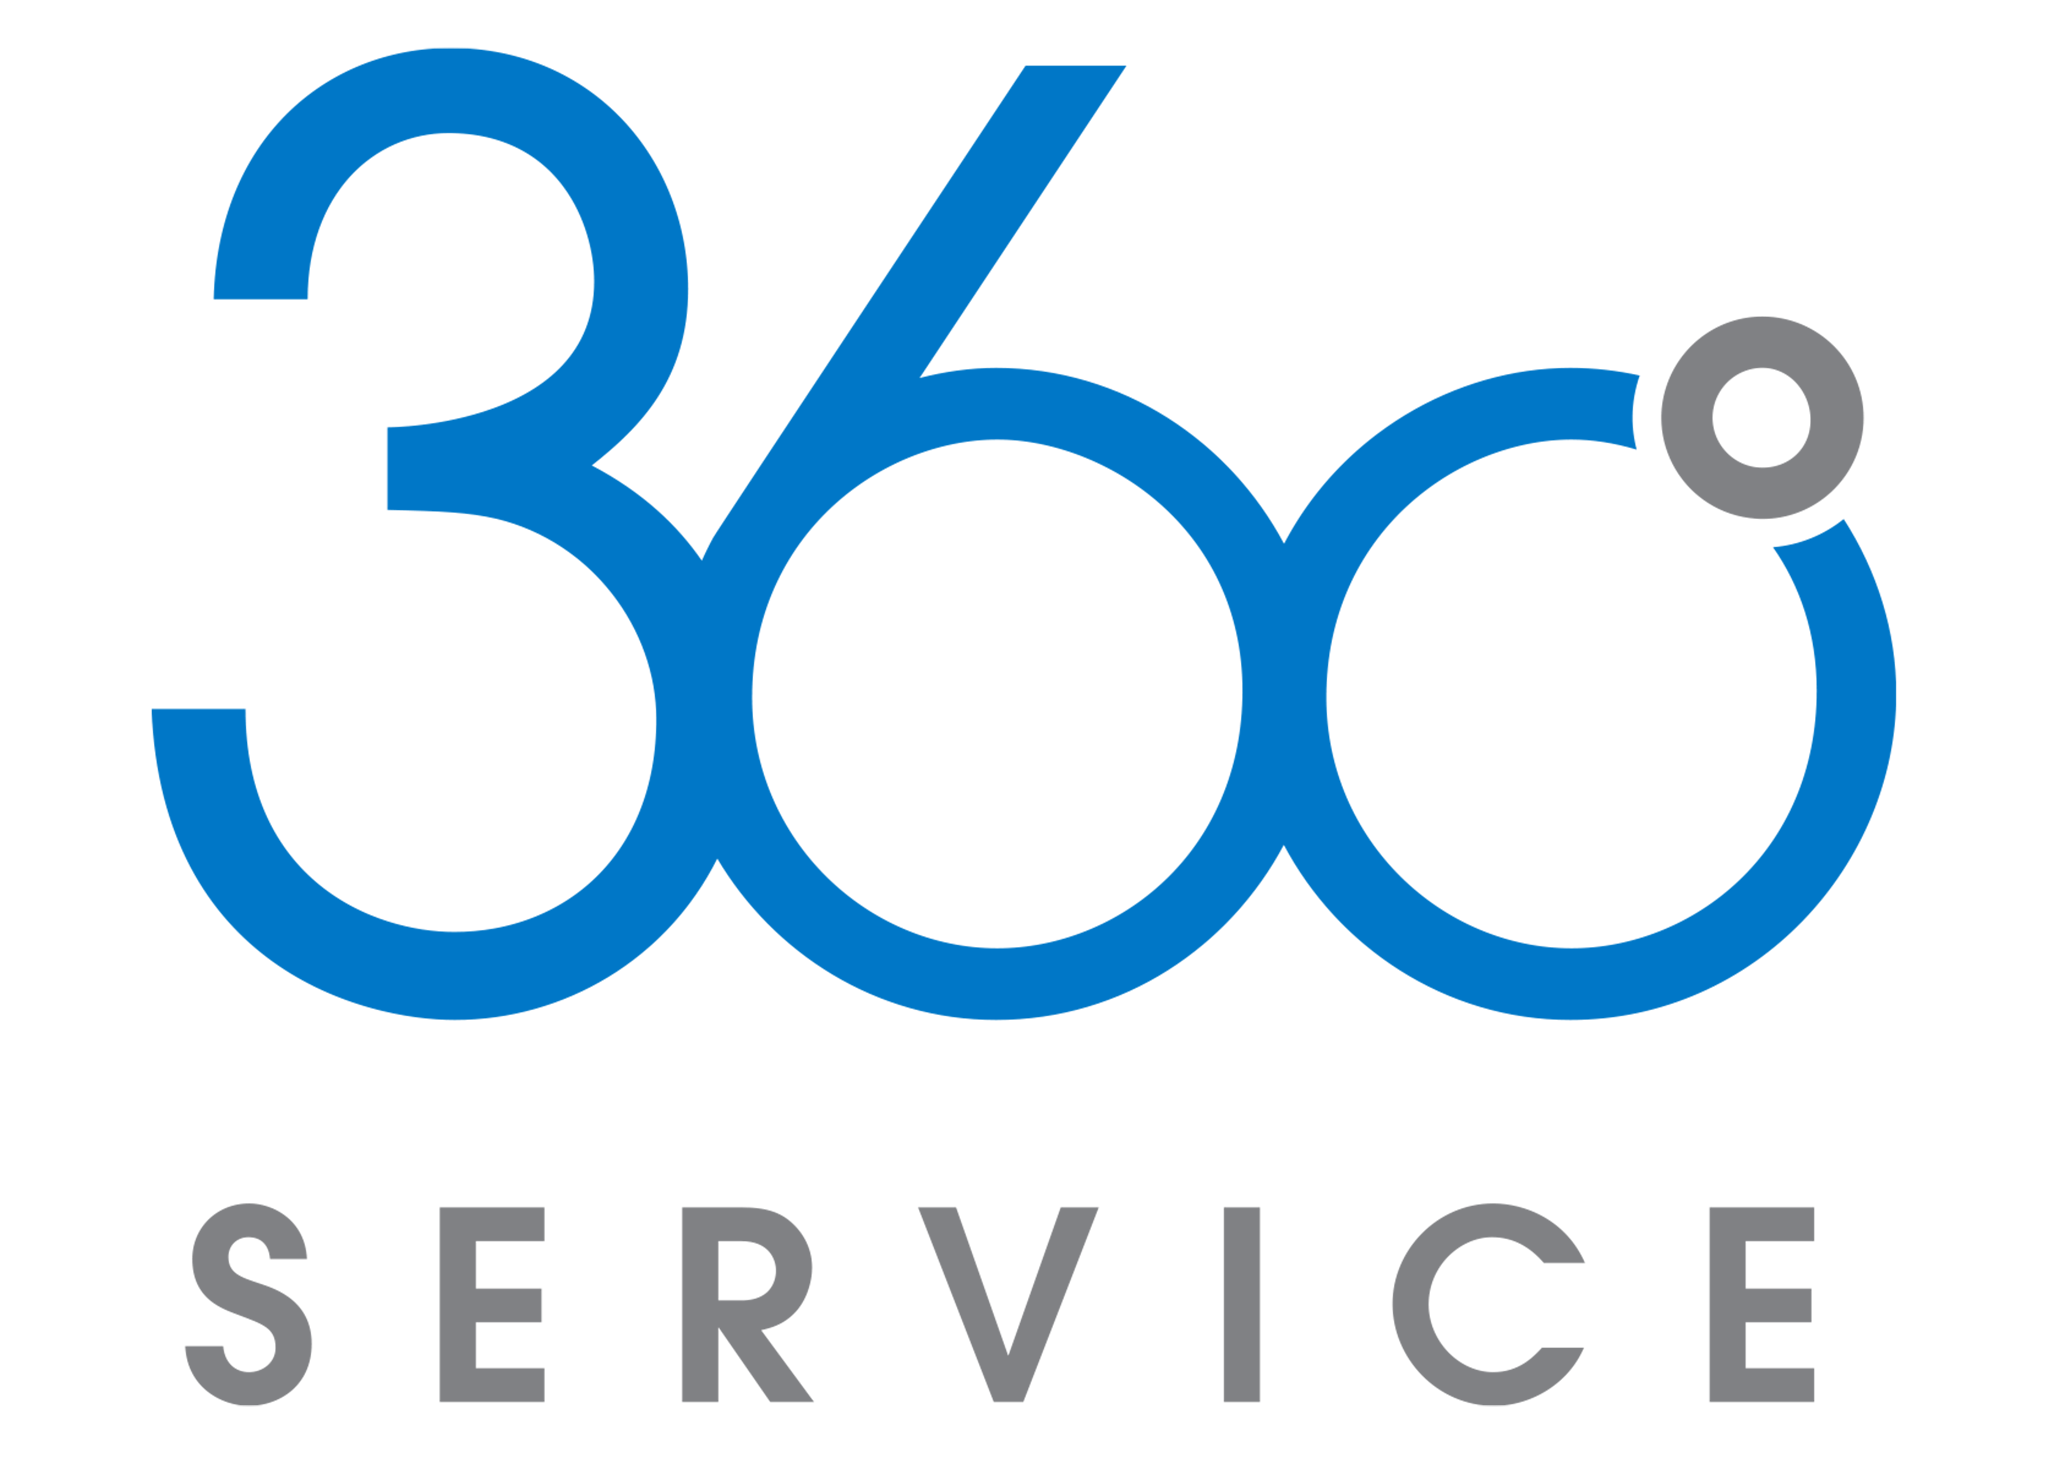 360 Service